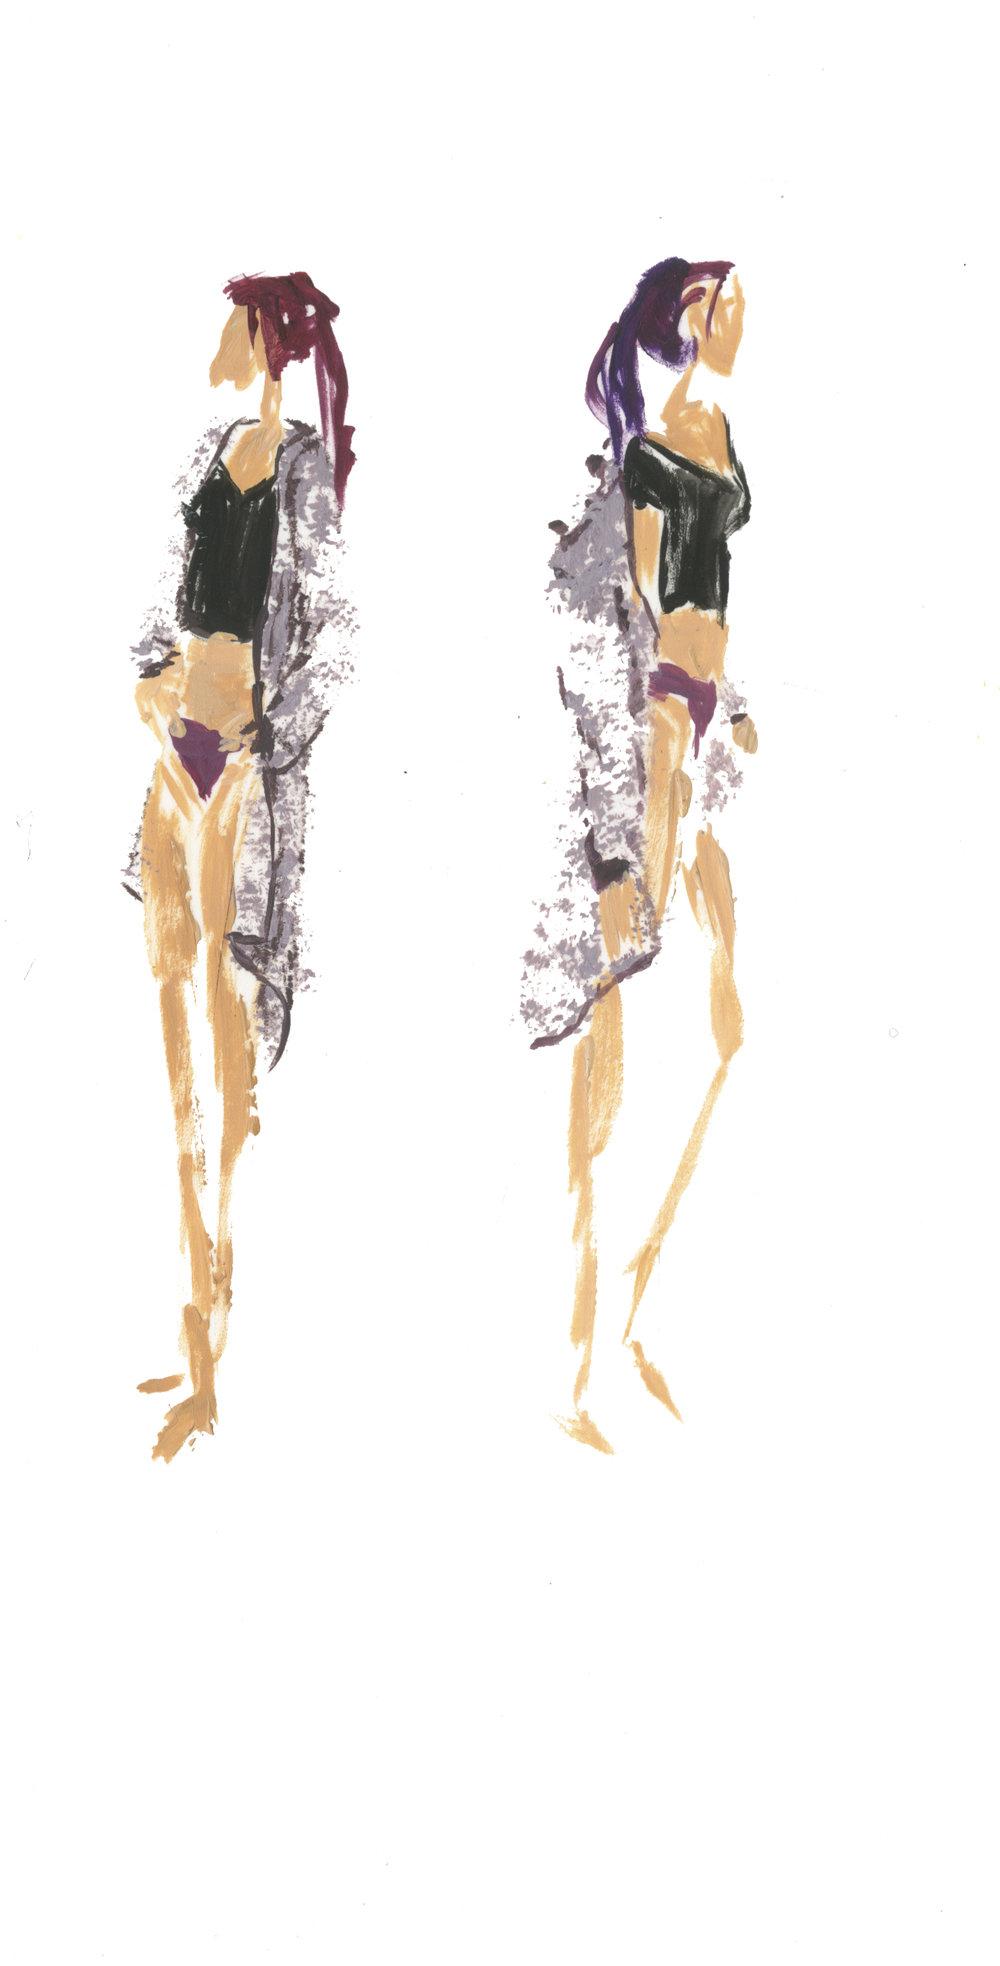 Anderson_FashionIllustration_Acrylic_duet.jpg